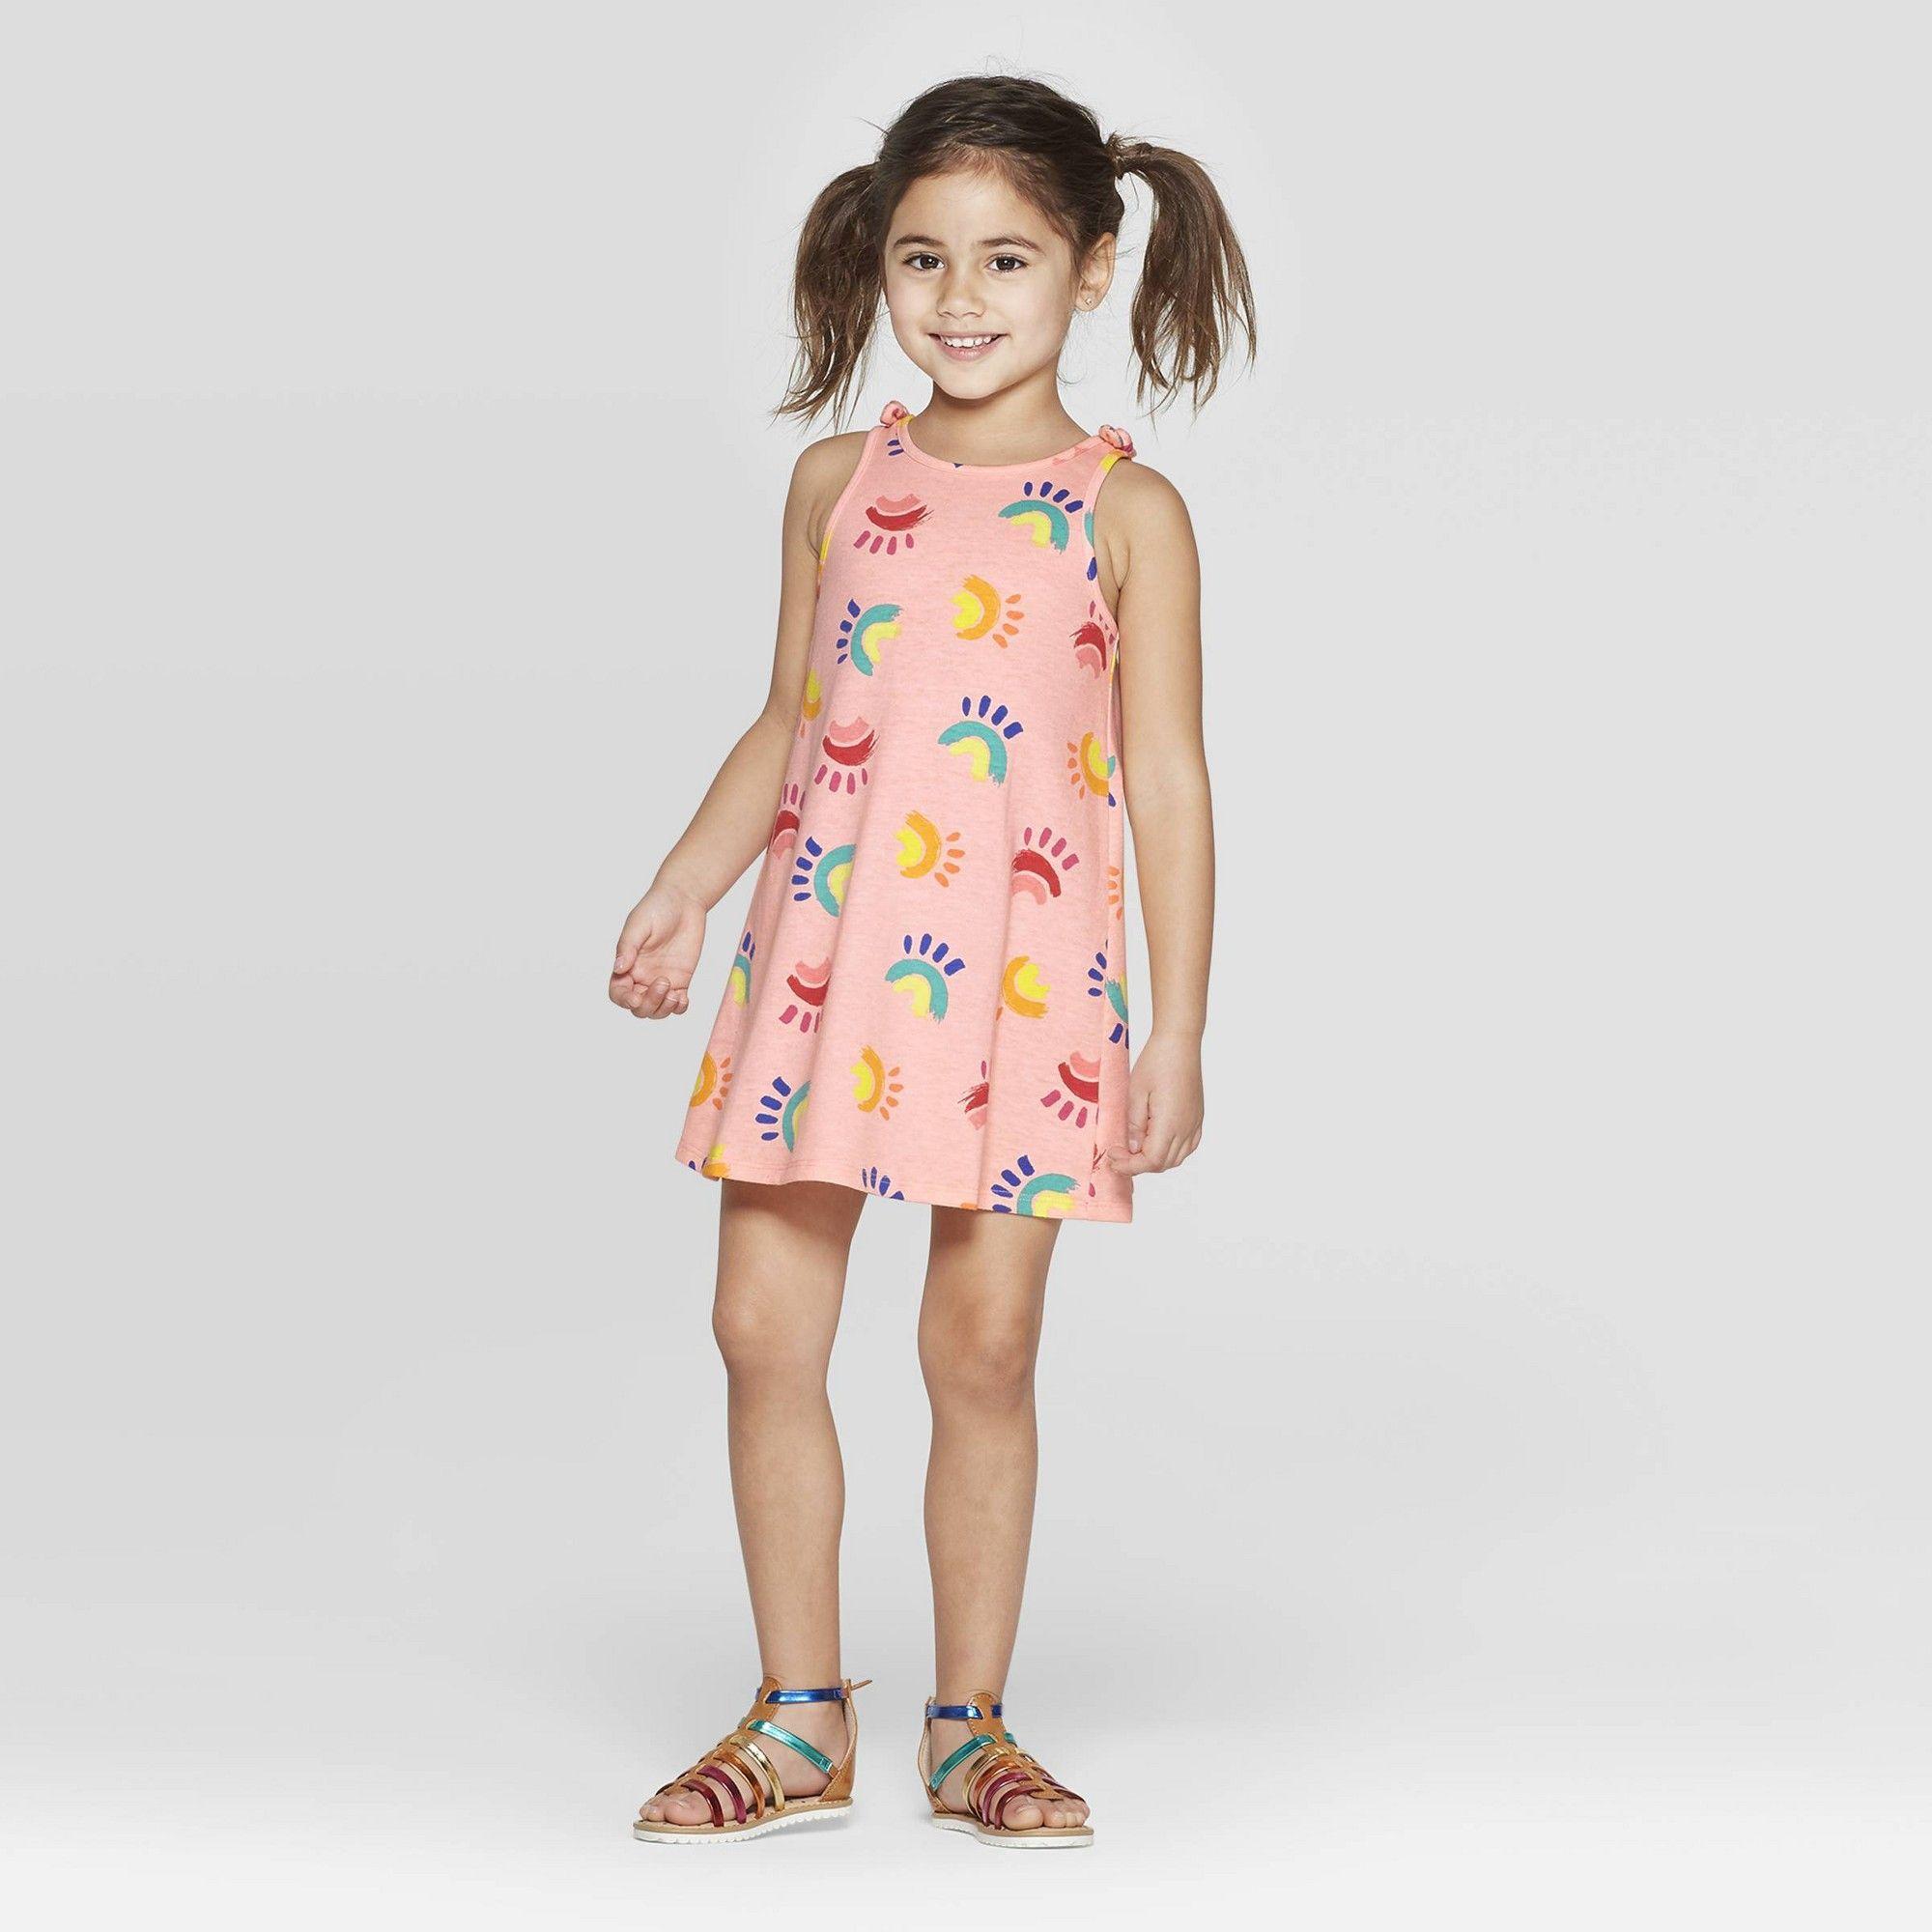 56d7c6556 Toddler Girls' A Line Dress - Cat & Jack Peach 3T, Girl's, Purple in ...